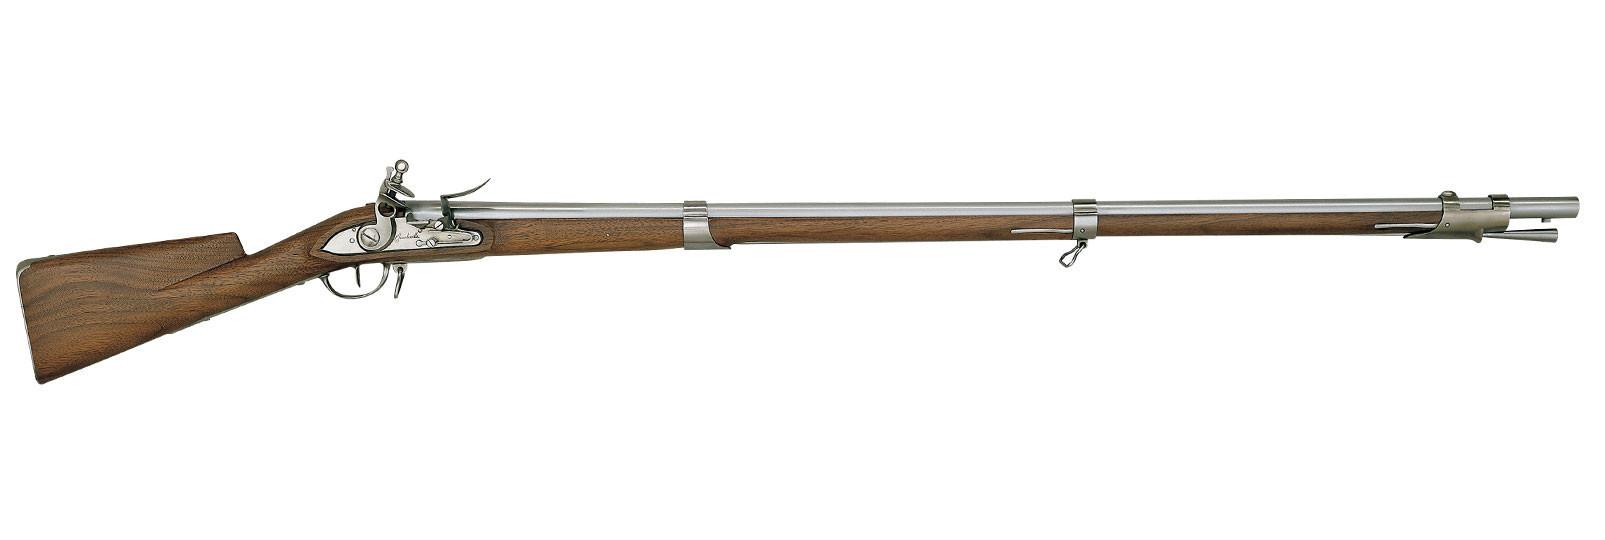 1763 Leger 1766 Charleville Rifle